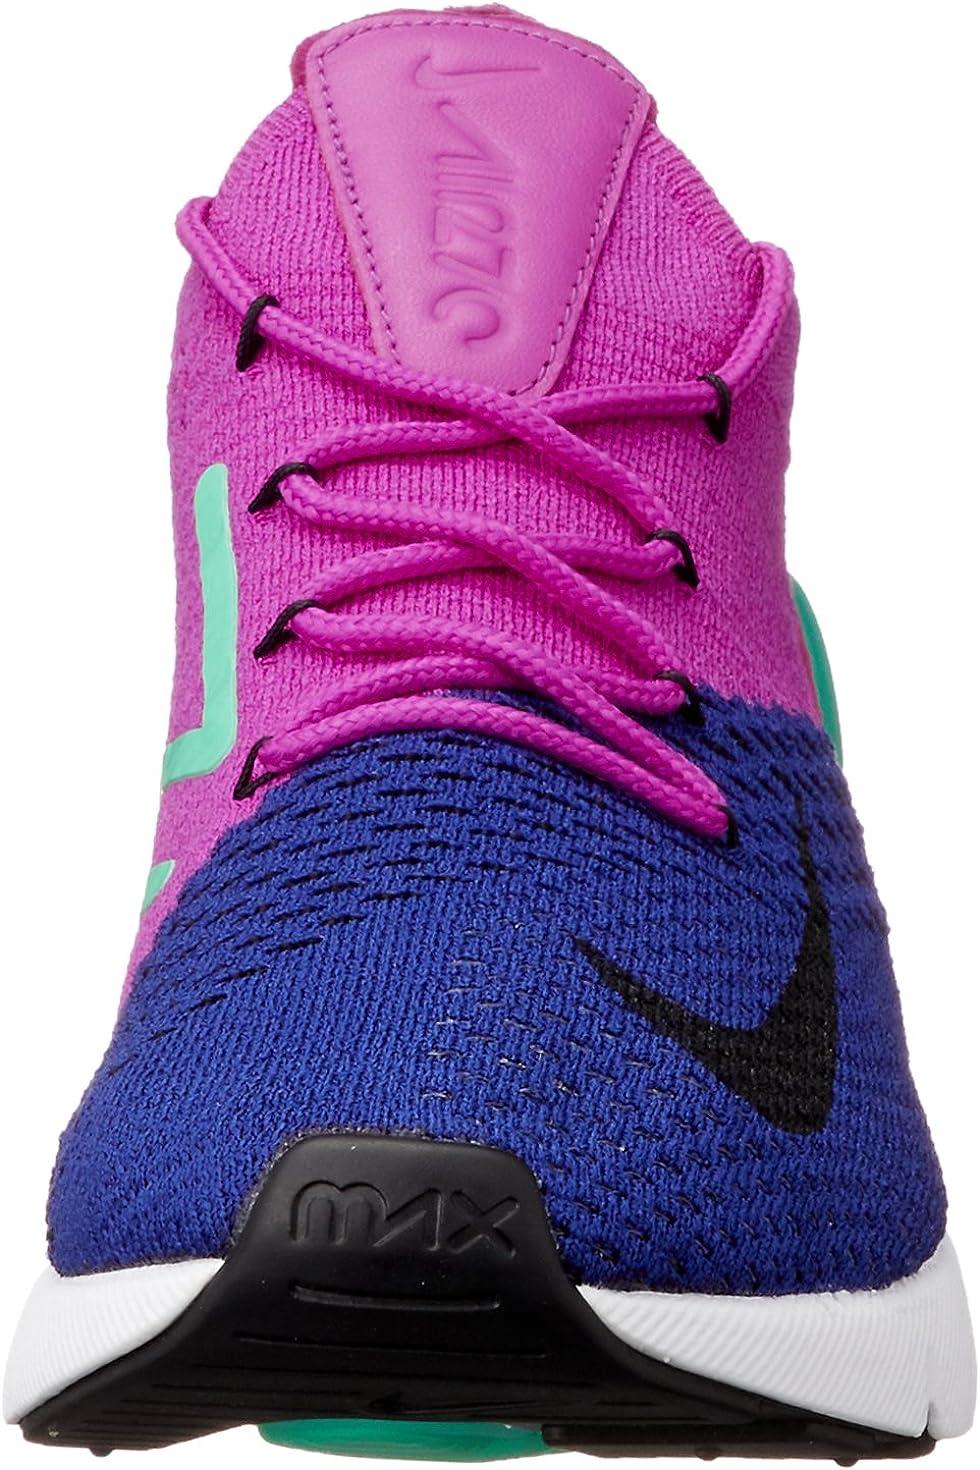 matiz eficacia asiático  Amazon.com | Nike Air Max 270 Flyknit Deep Royal Blue/Black | Road Running